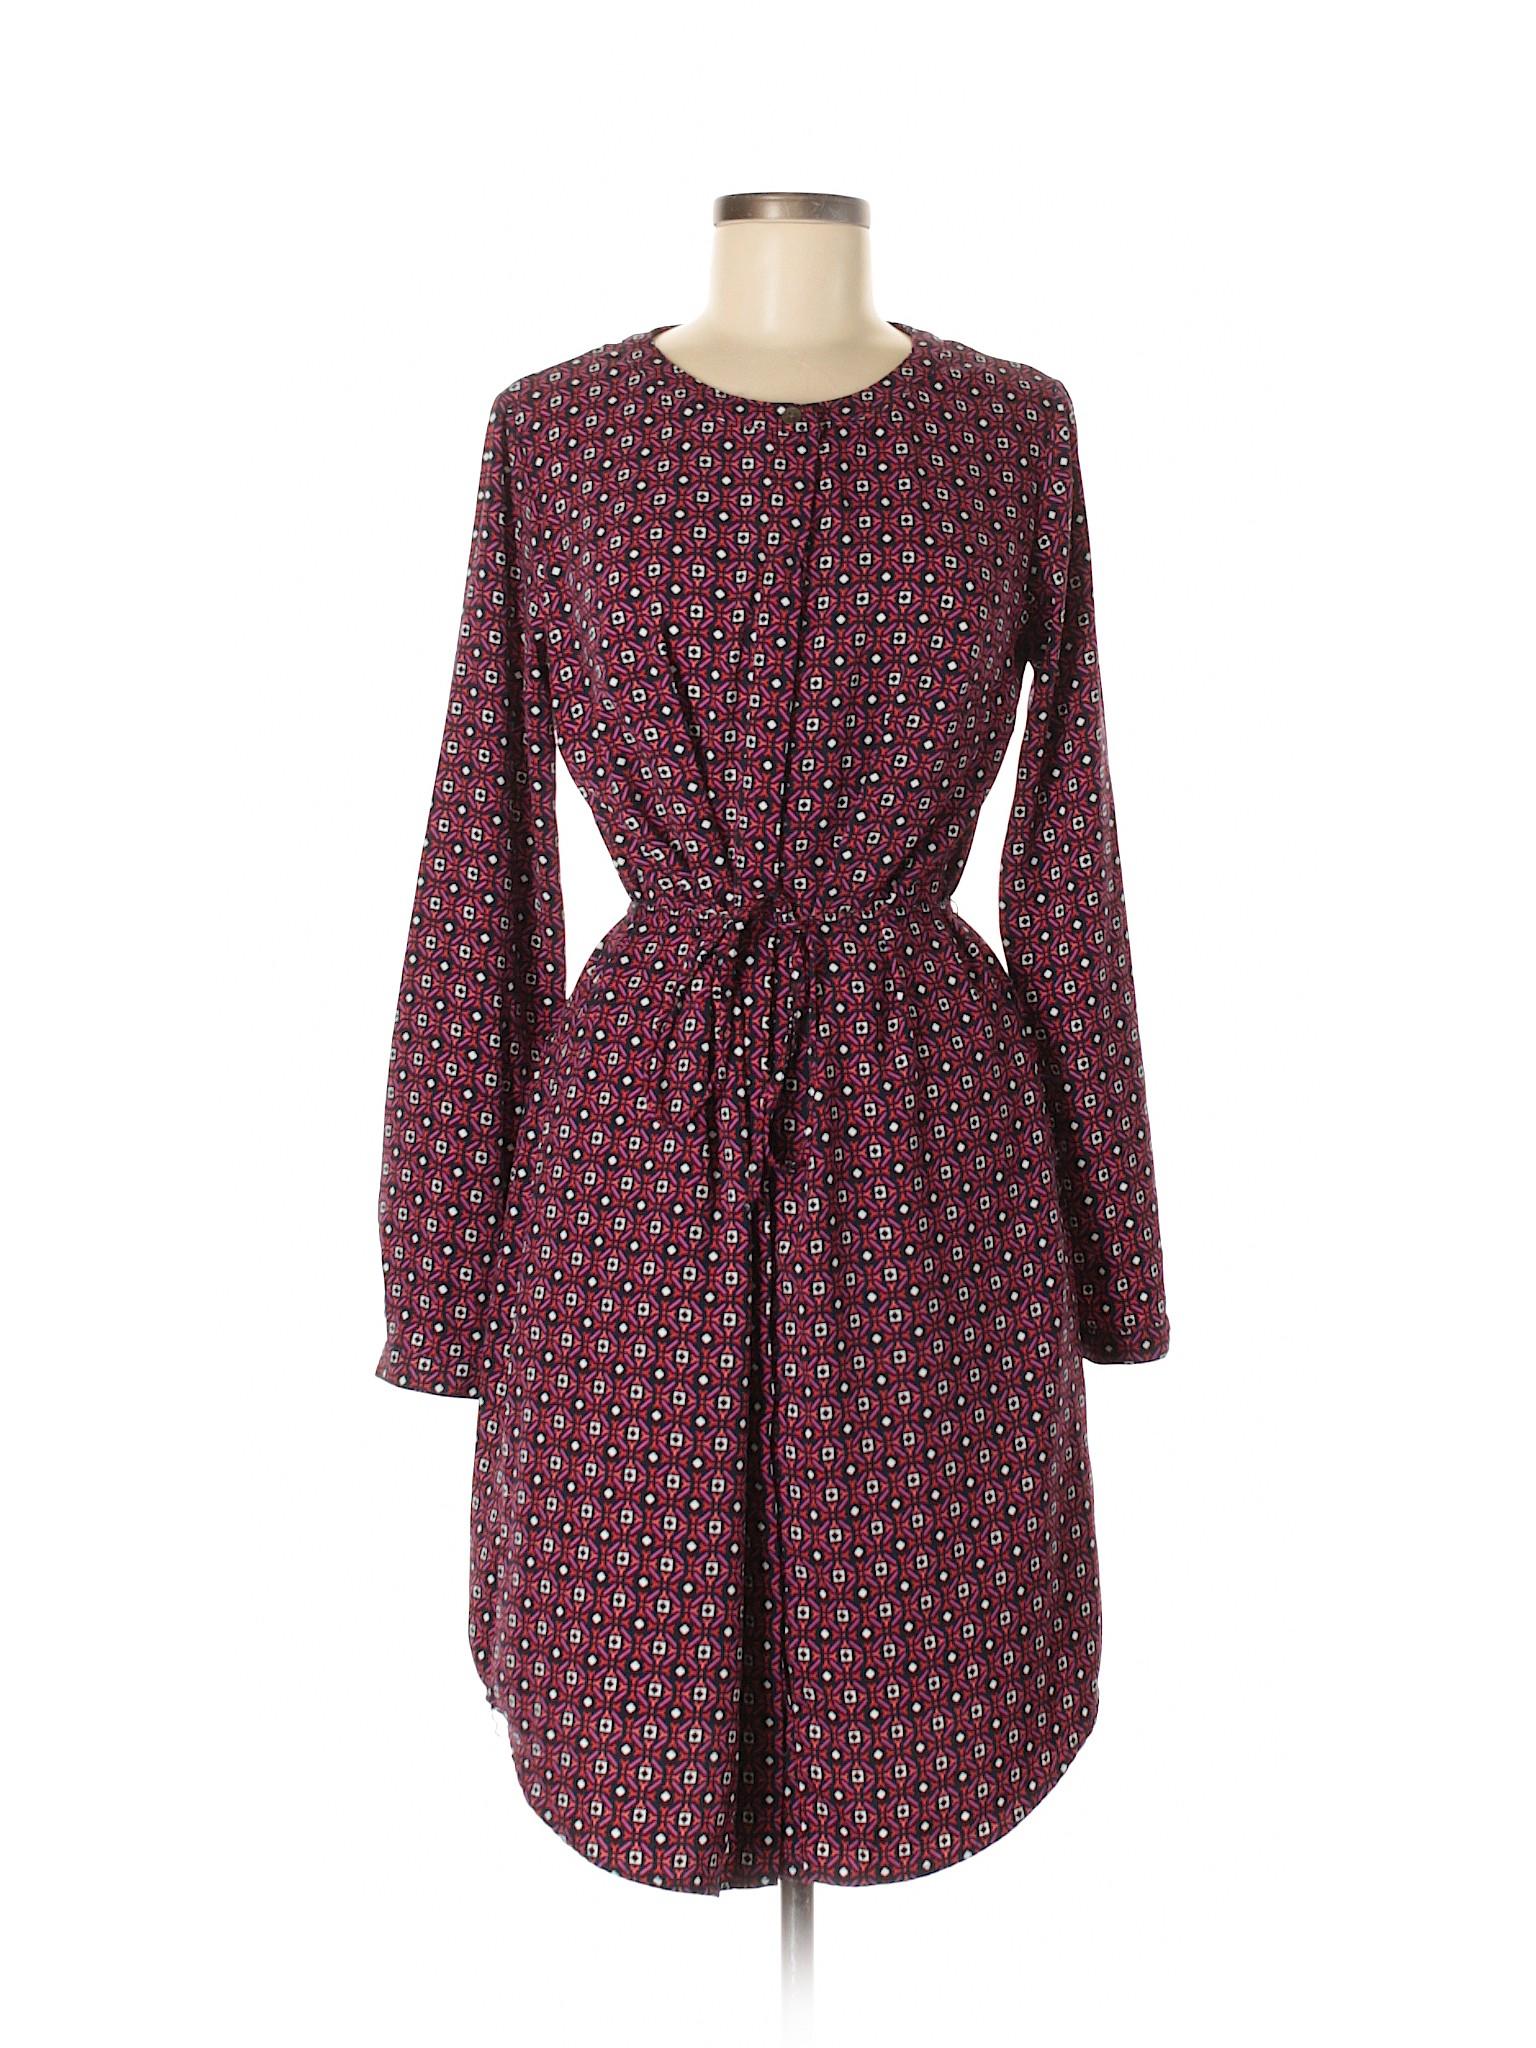 Merona Casual Boutique winter Boutique winter Dress Casual Merona Hd1Rnw